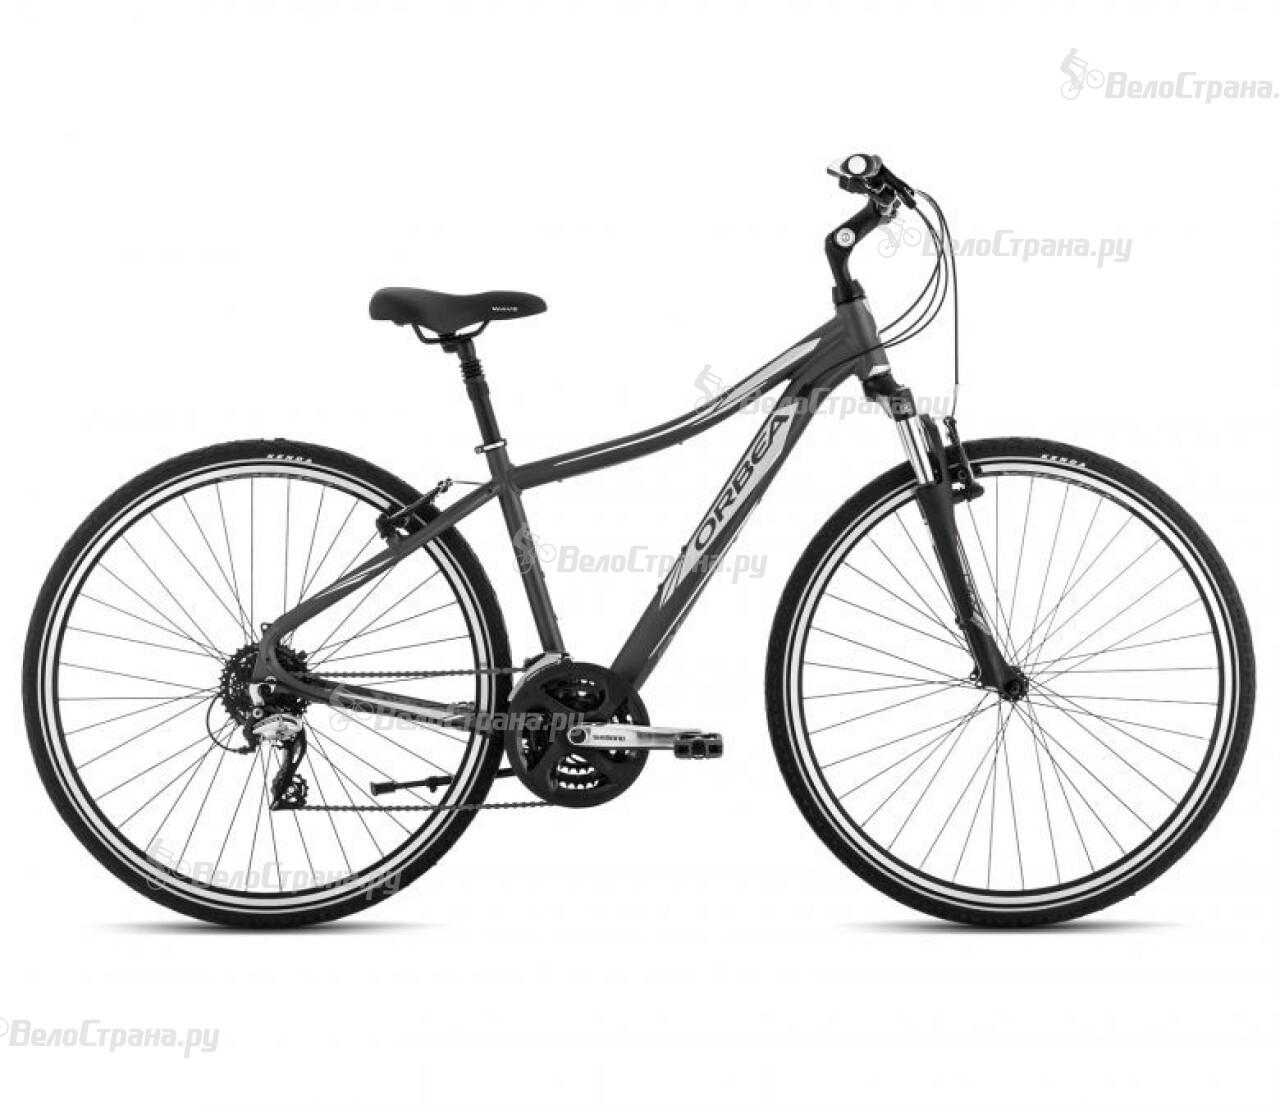 Велосипед Orbea Comfort 28 20 Entrance (2014) велосипед orbea comfort 28 40 entrance eq 2014